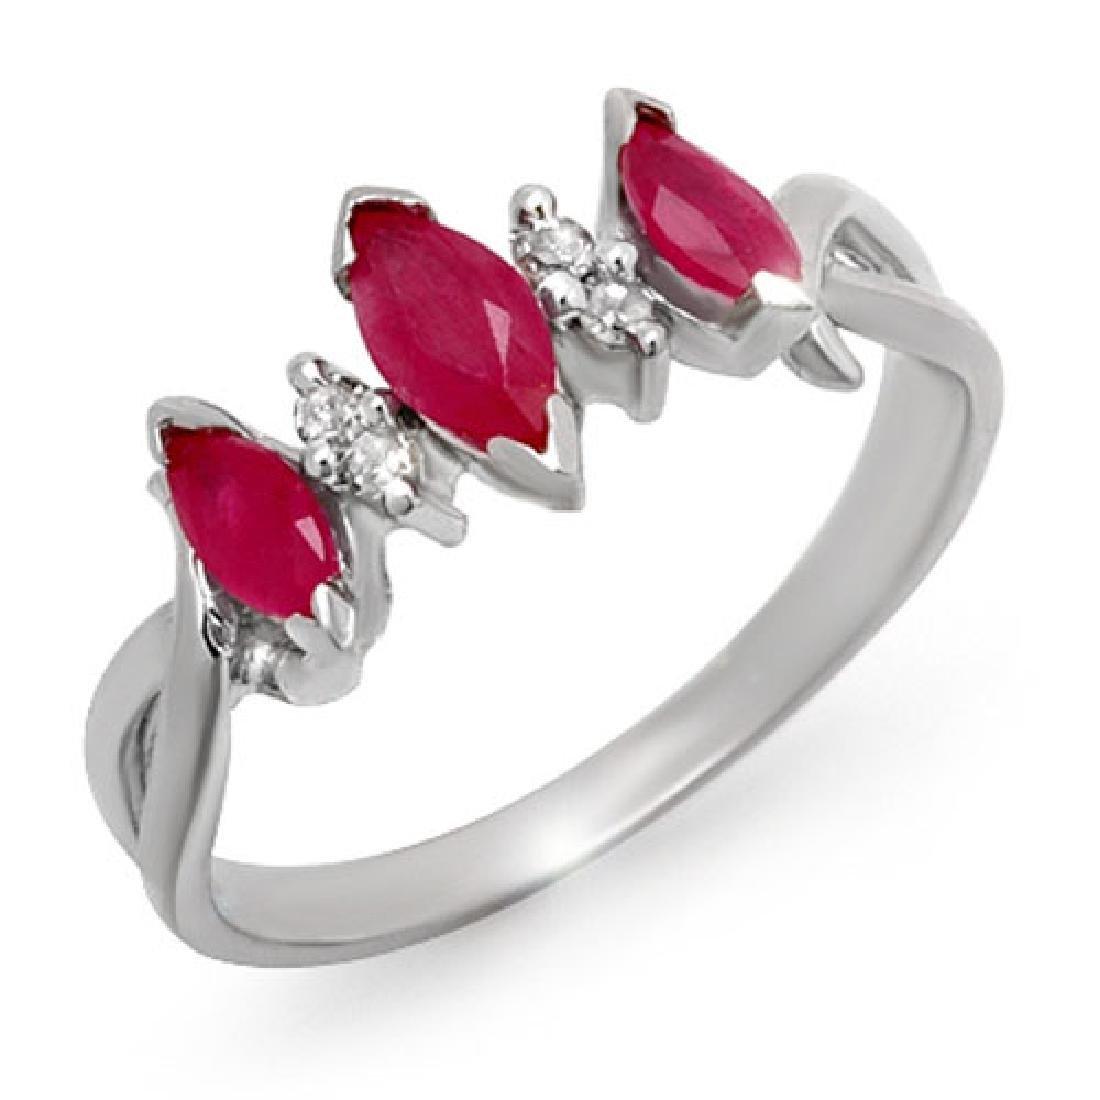 0.57 CTW Ruby & Diamond Ring 18K White Gold